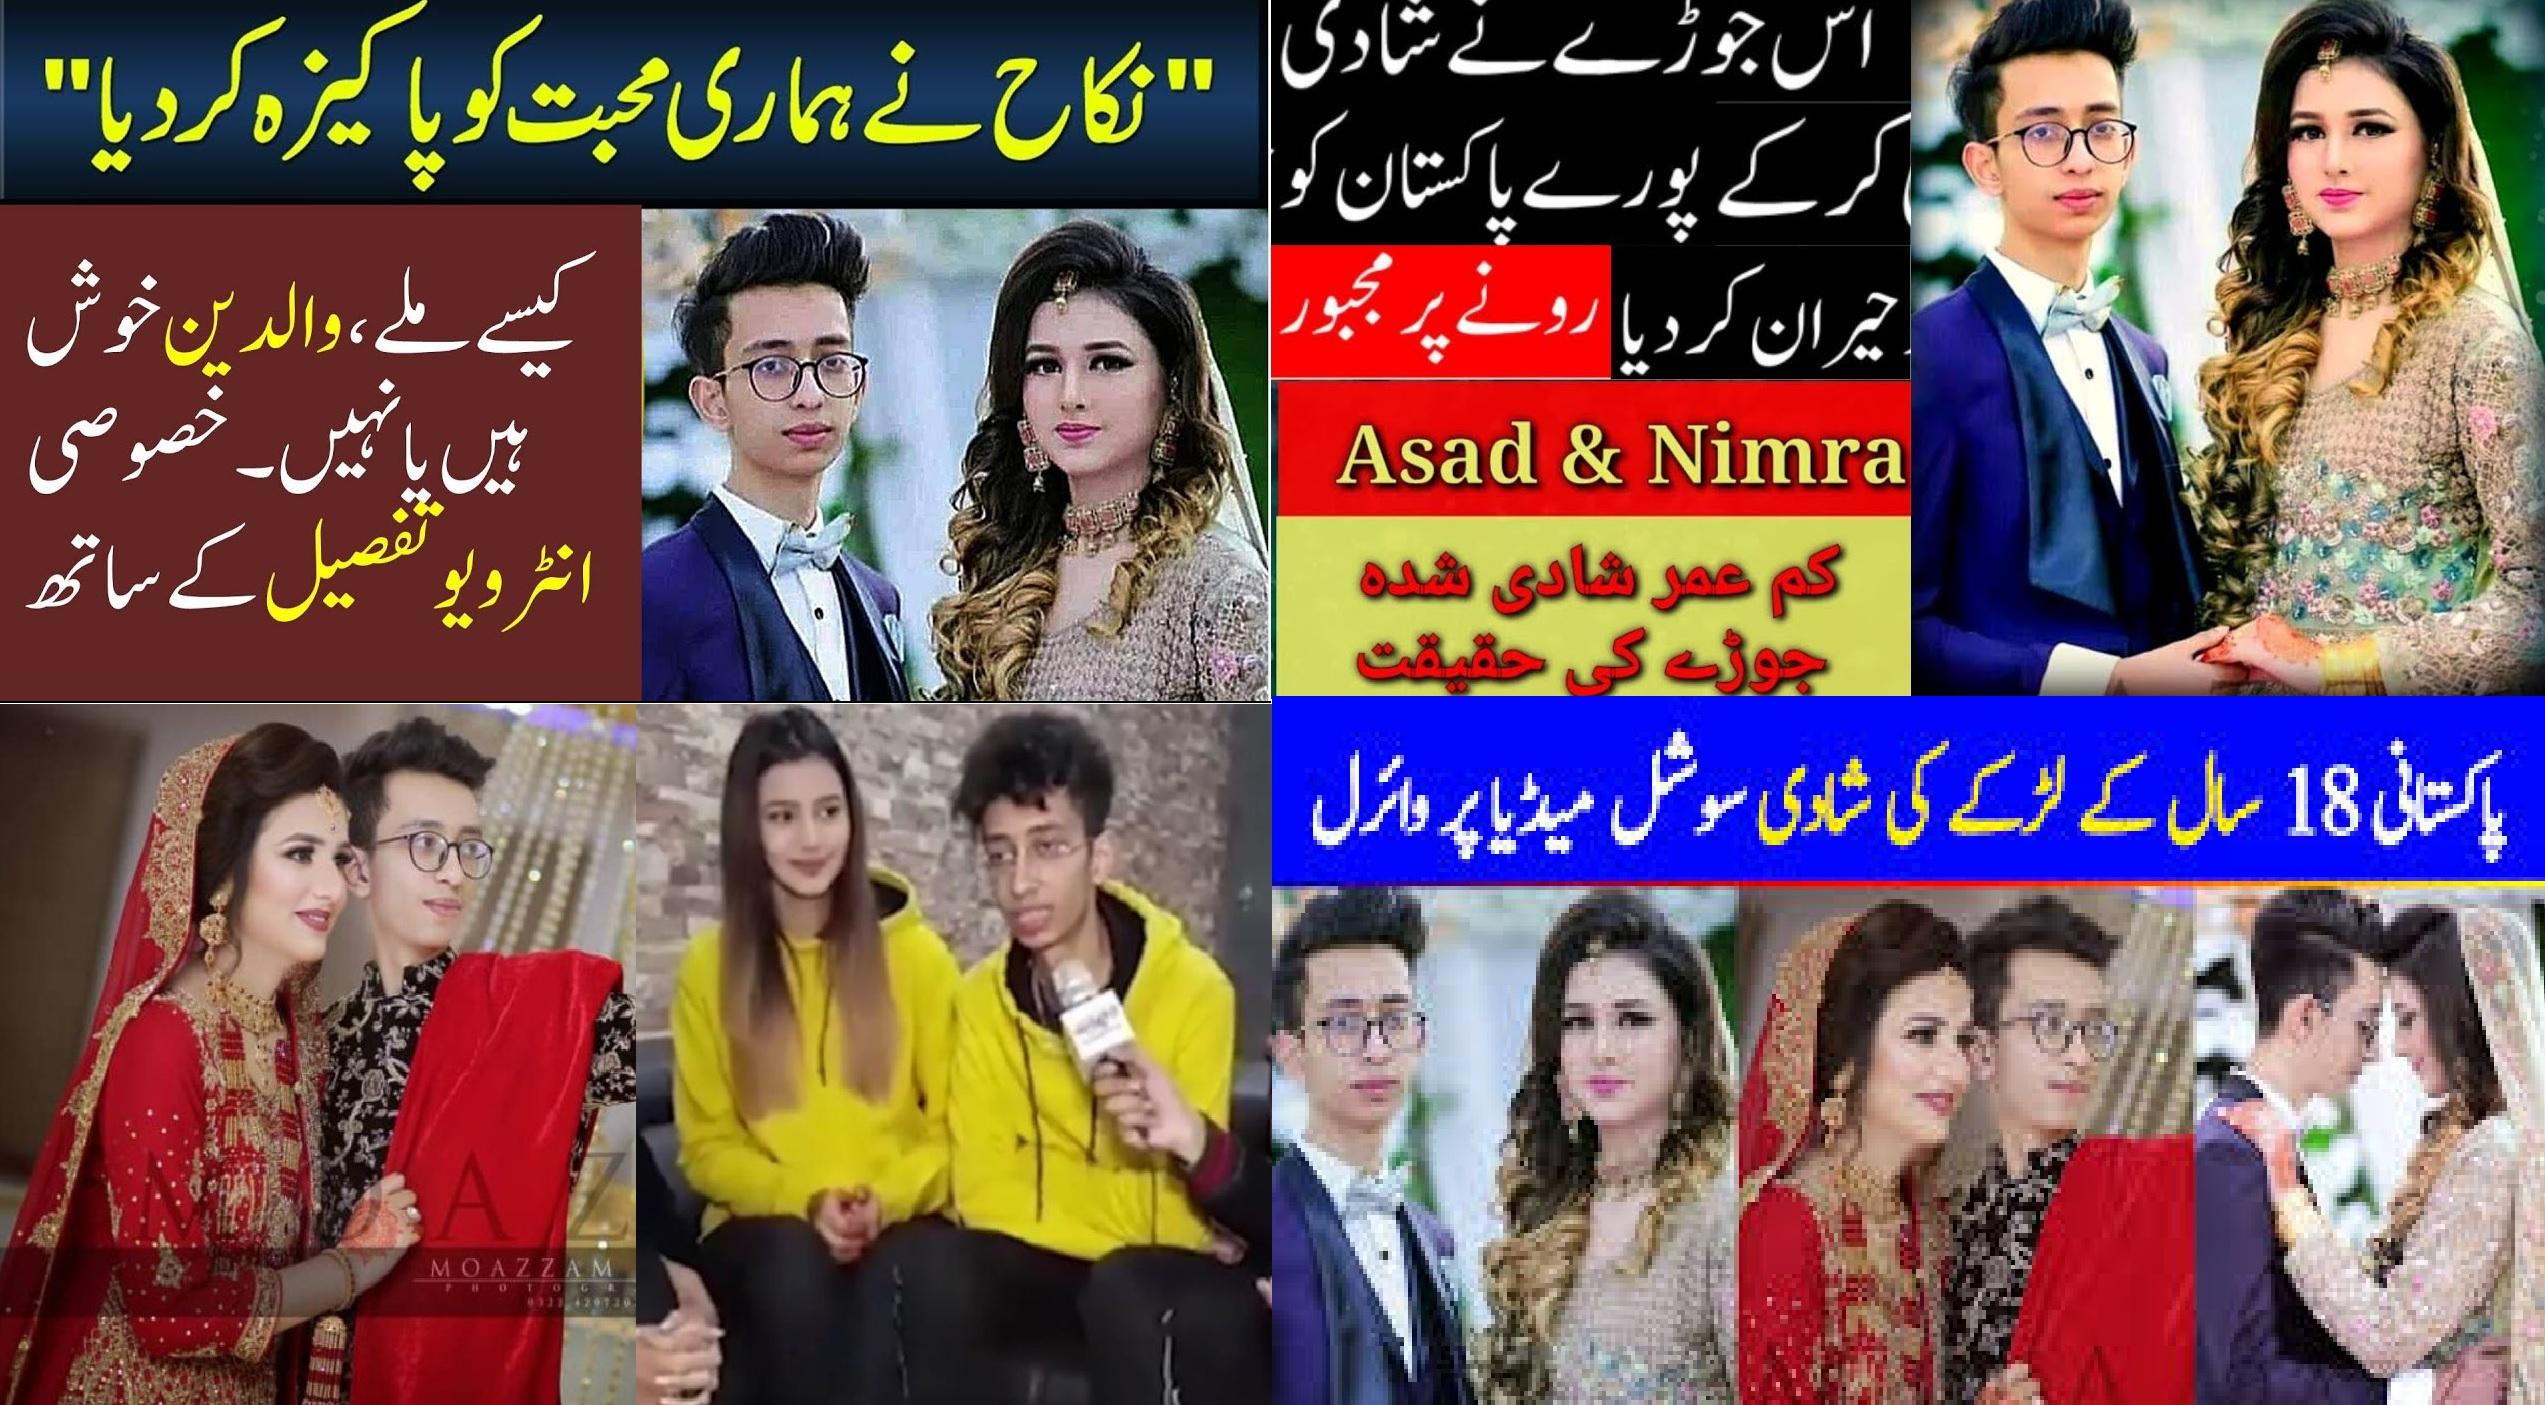 Social Media Viral Young Couple Asad and Nimra Merriage Clicks